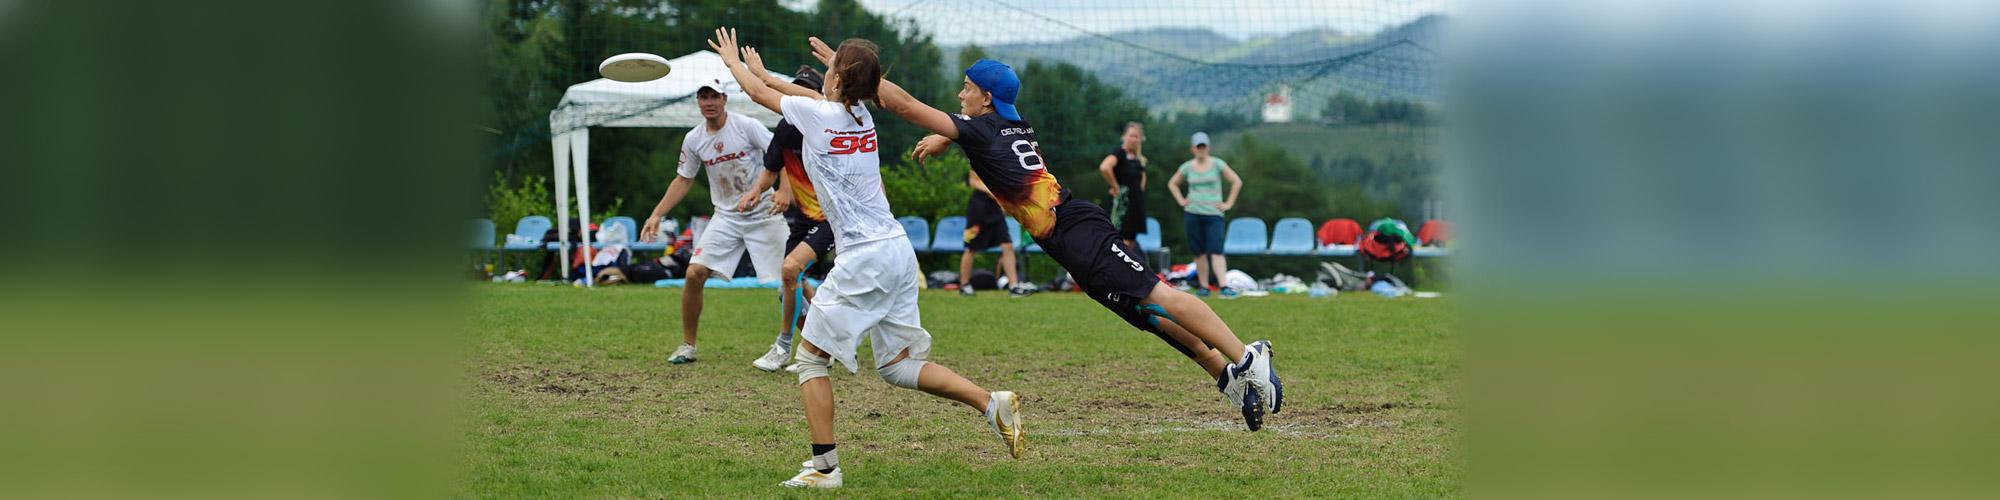 rentree-sportive-ultimate-2015